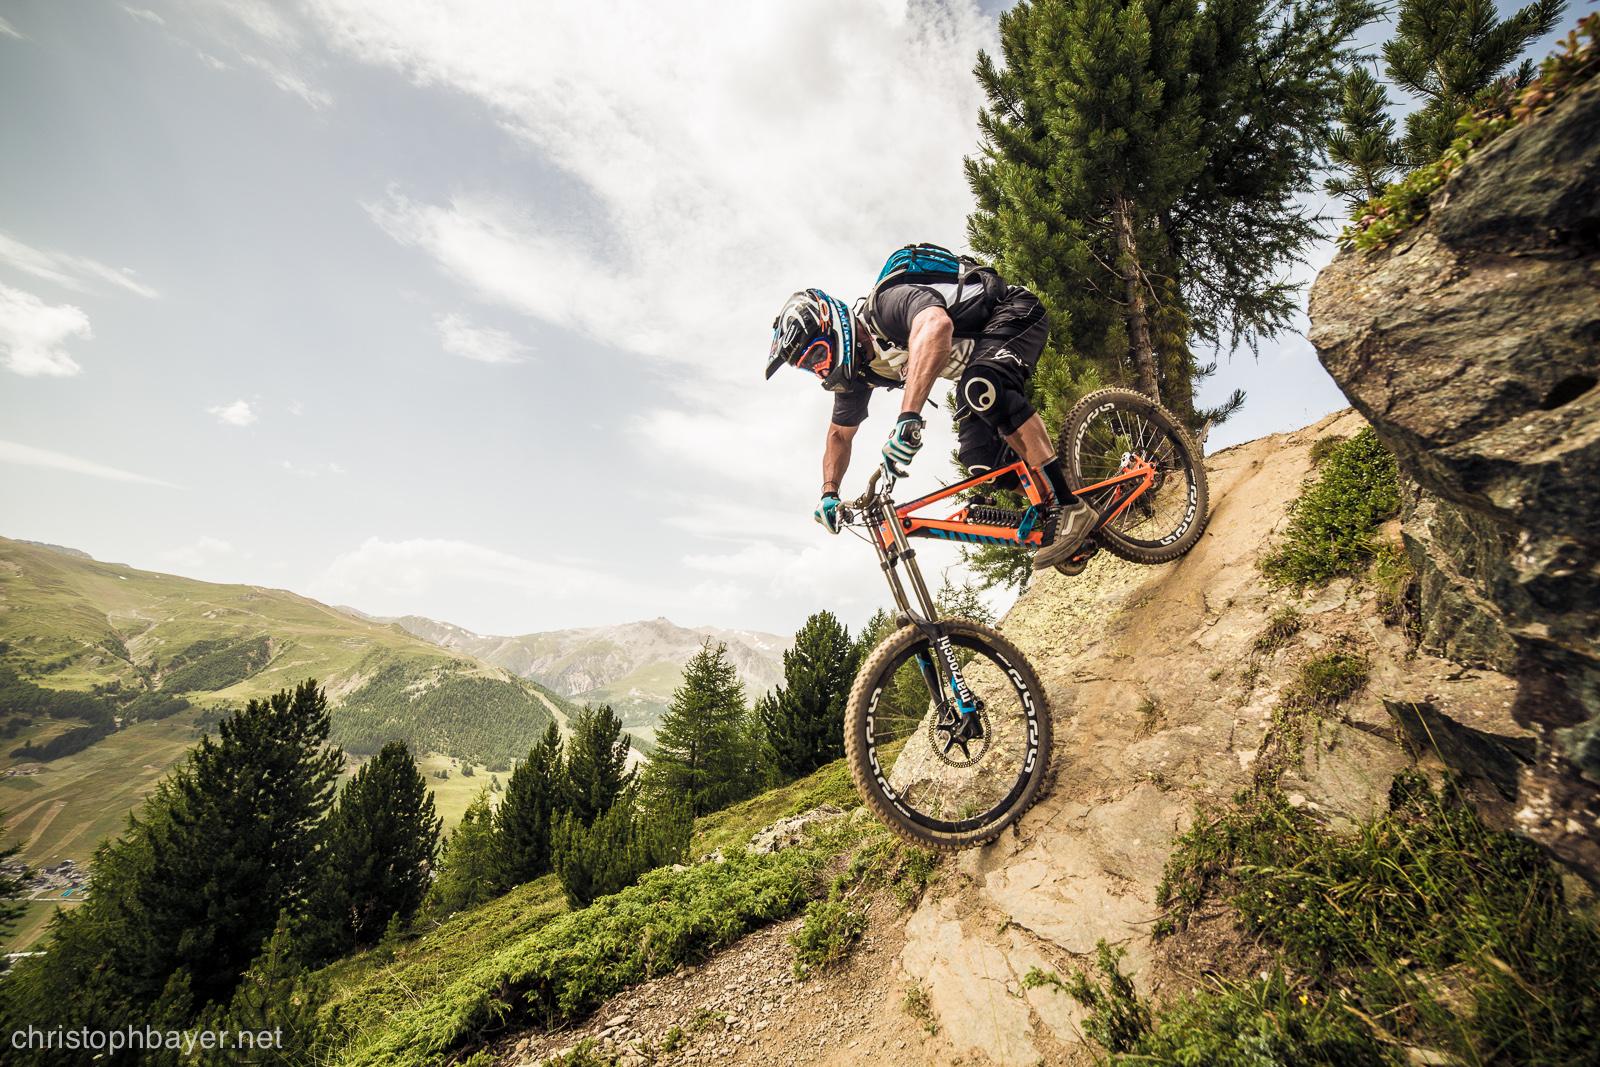 Riders durante downhill Bikepark Mottolino